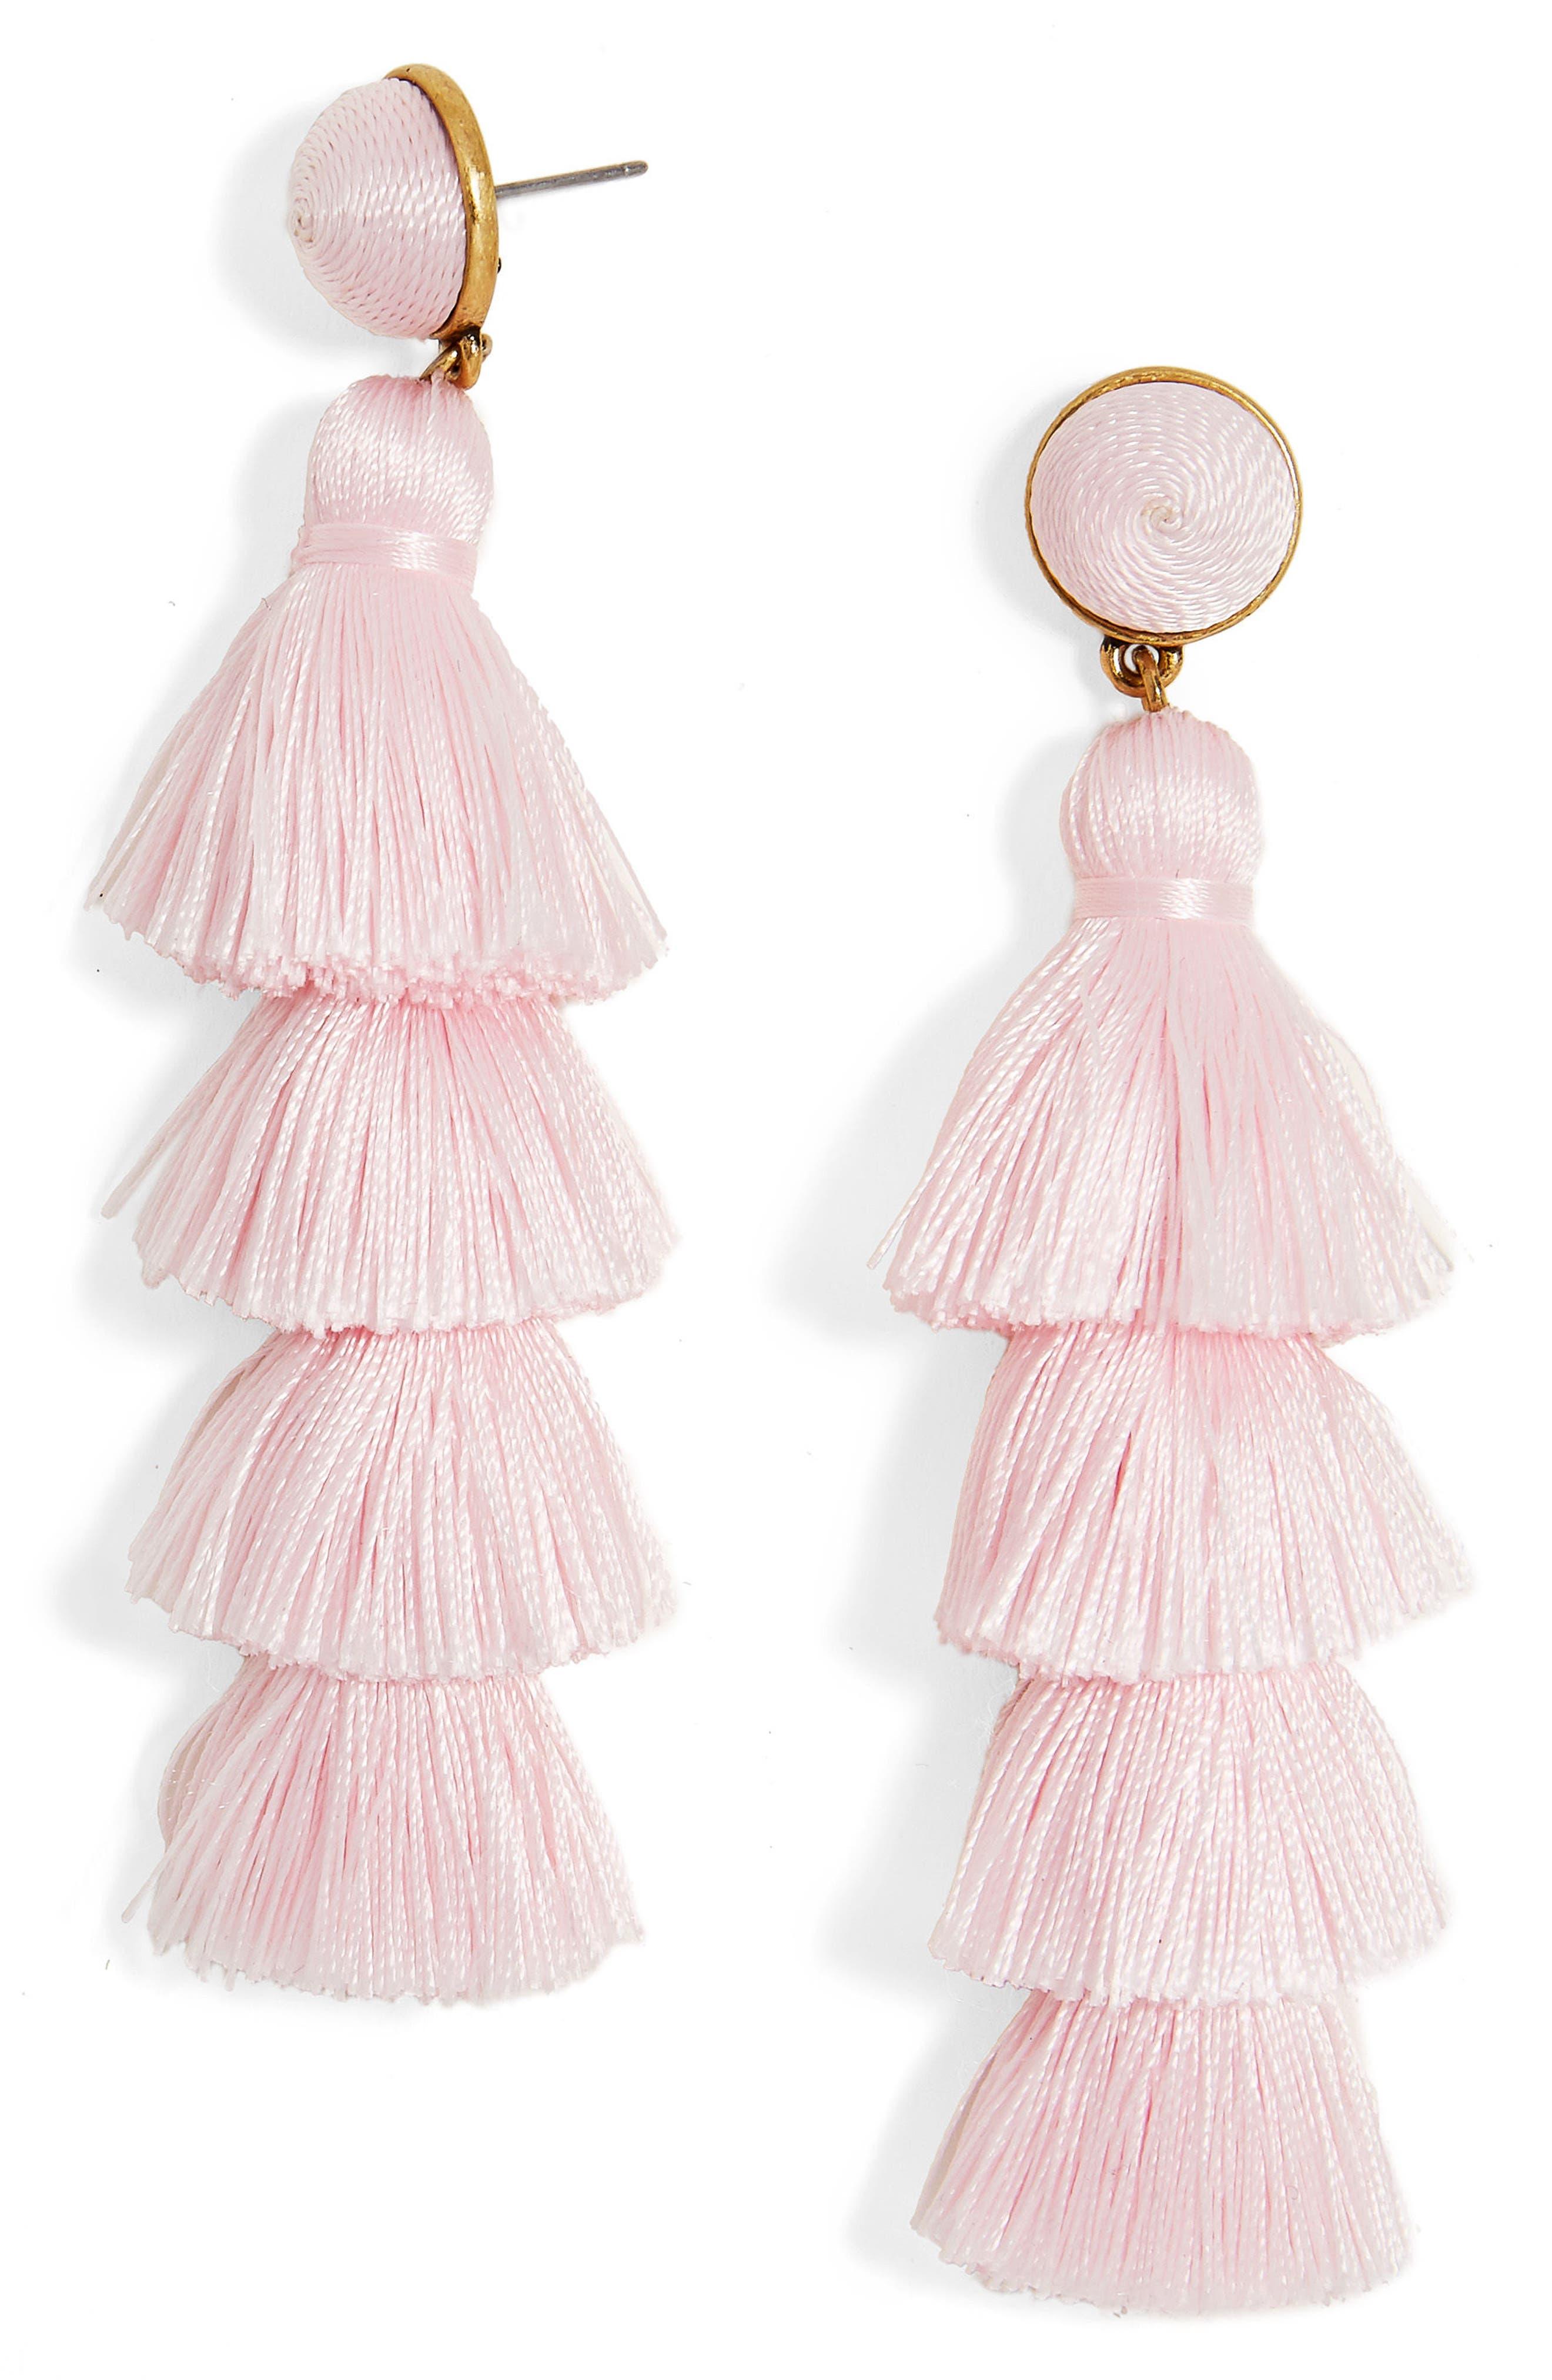 Drop earrings for women nordstrom baublebar gabriela tassel fringe earrings arubaitofo Image collections